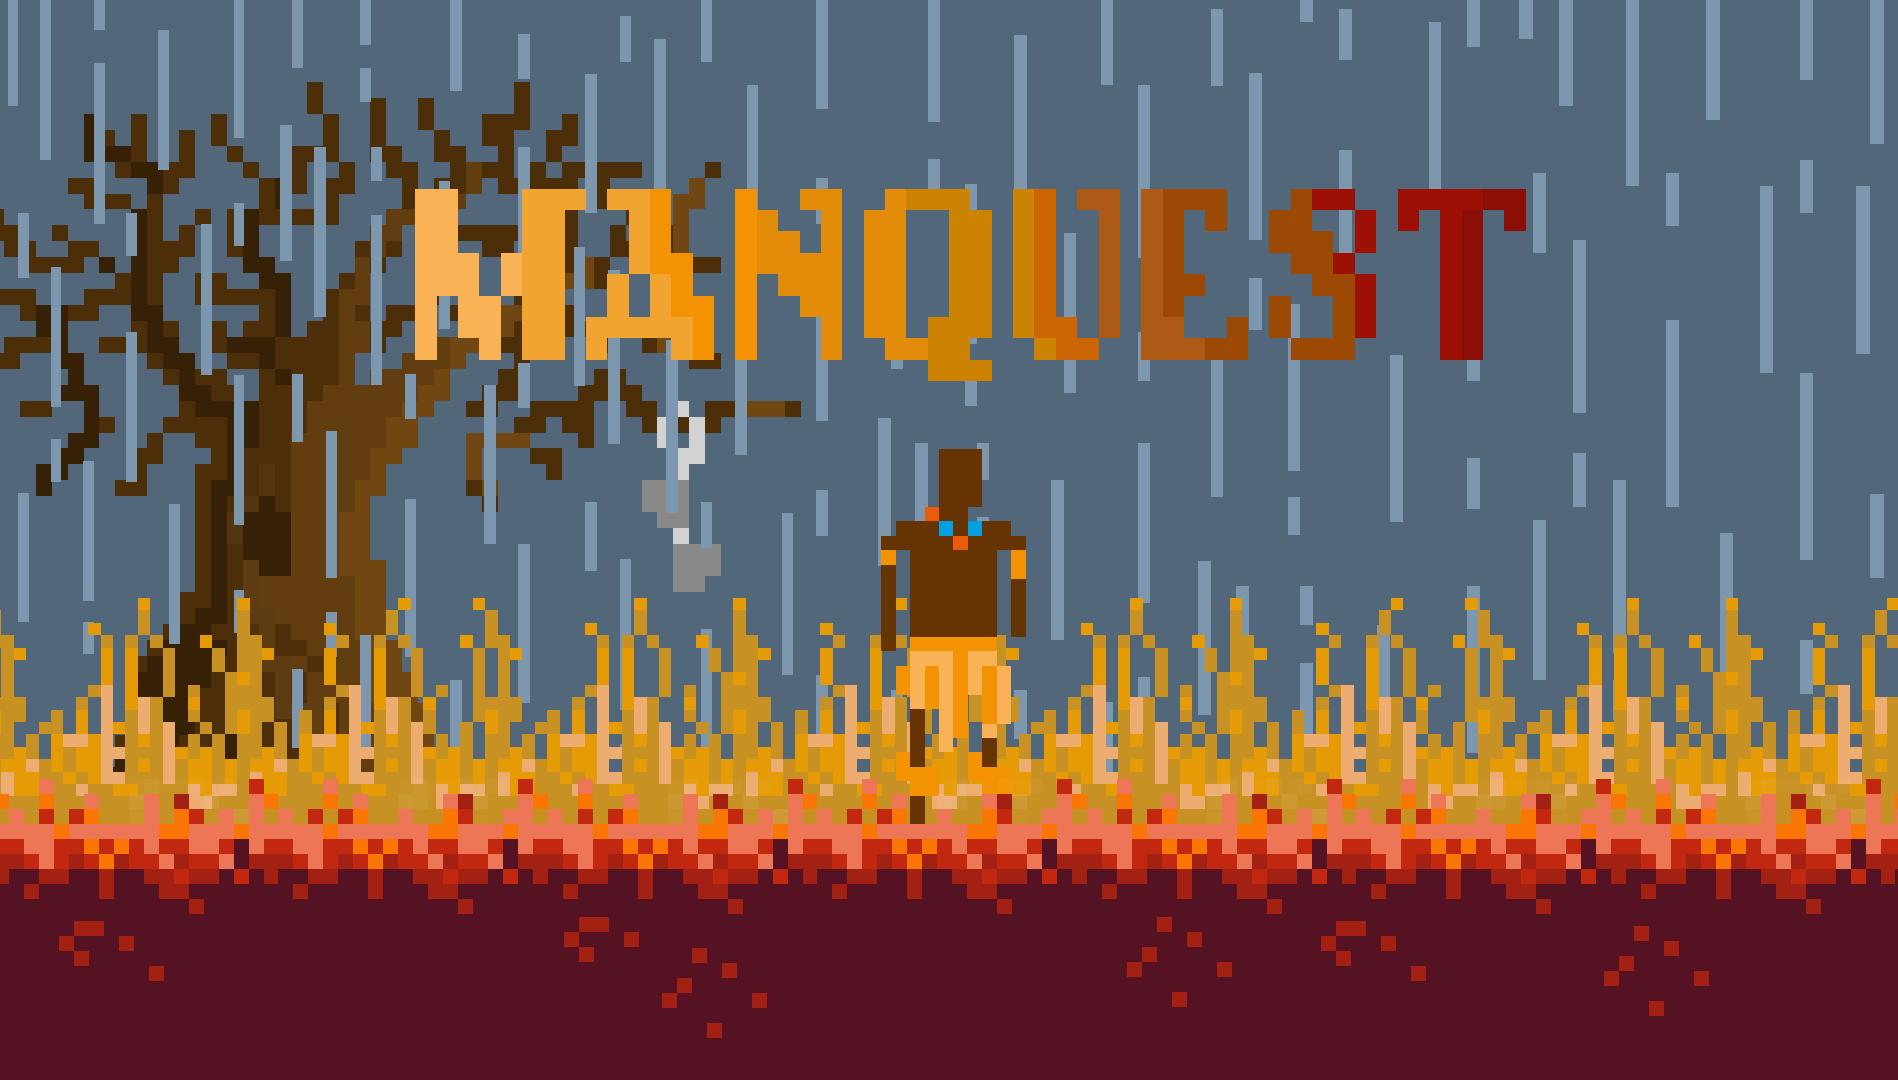 MANQUEST